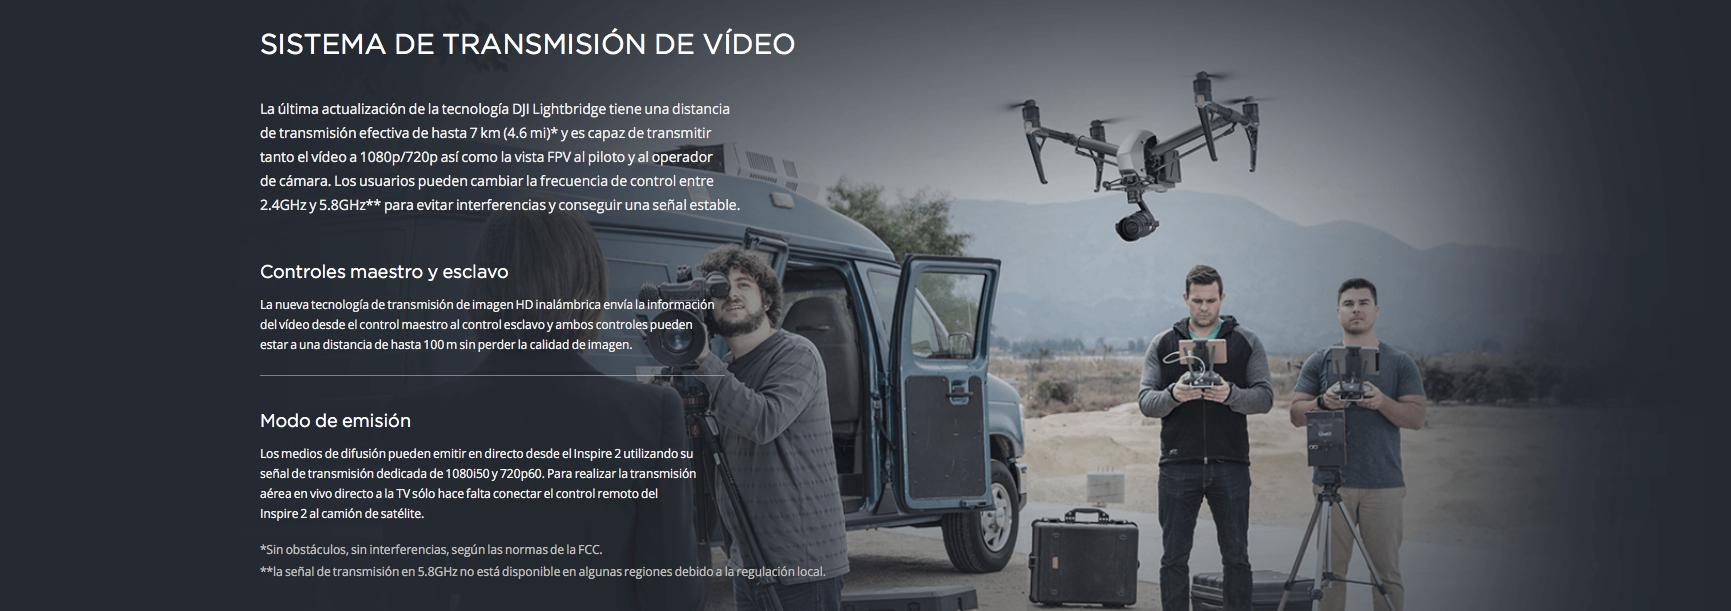 Sistema de transmisión de vídeo DJI INSPIRE 2